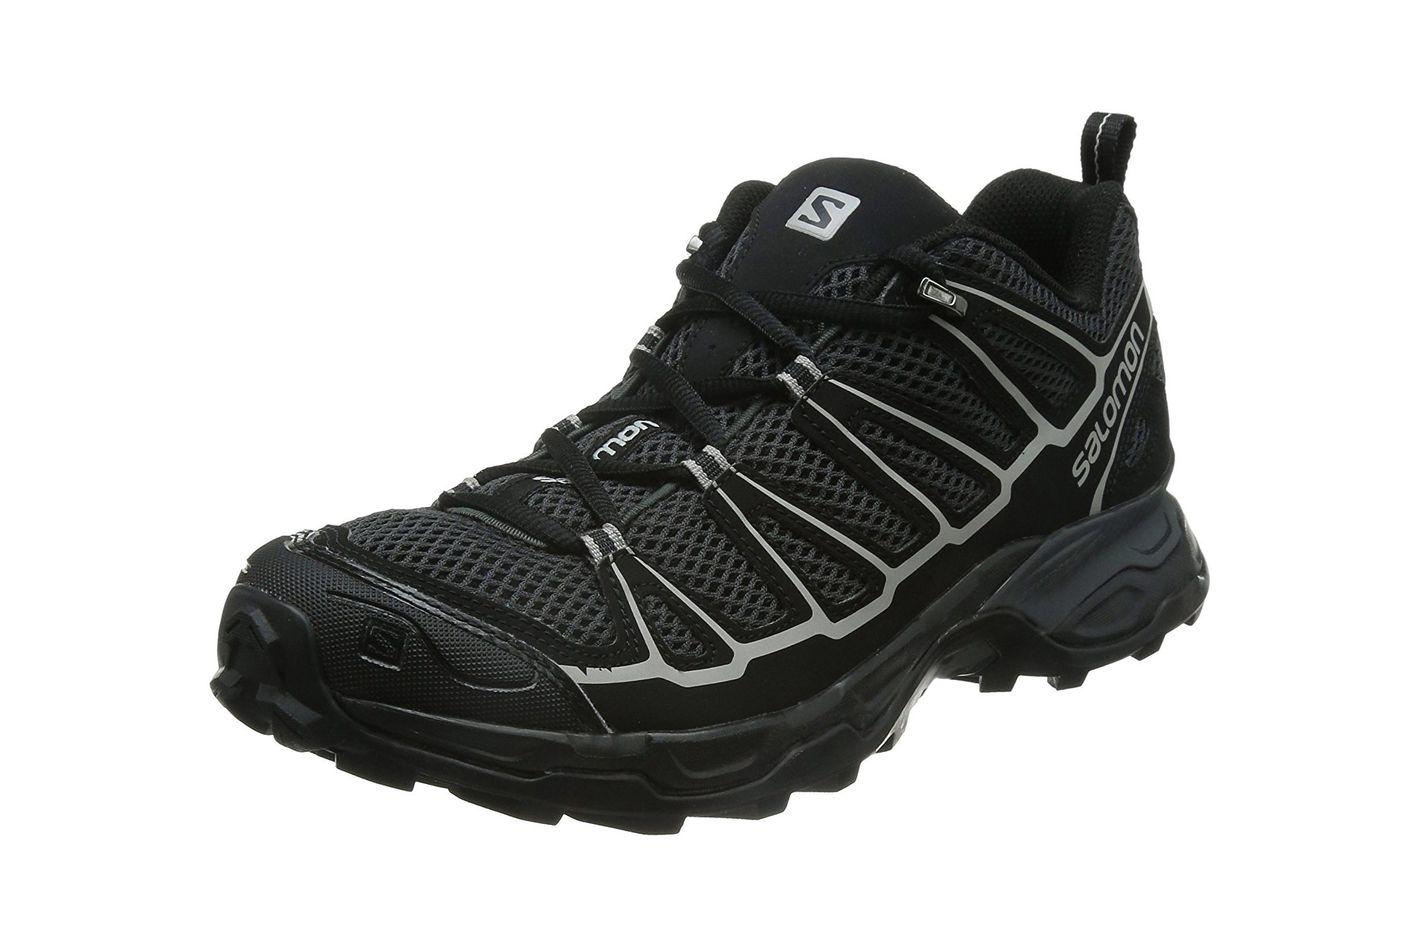 Salomon Men s X Ultra Prime Hiking Shoes d0931a63c1e4